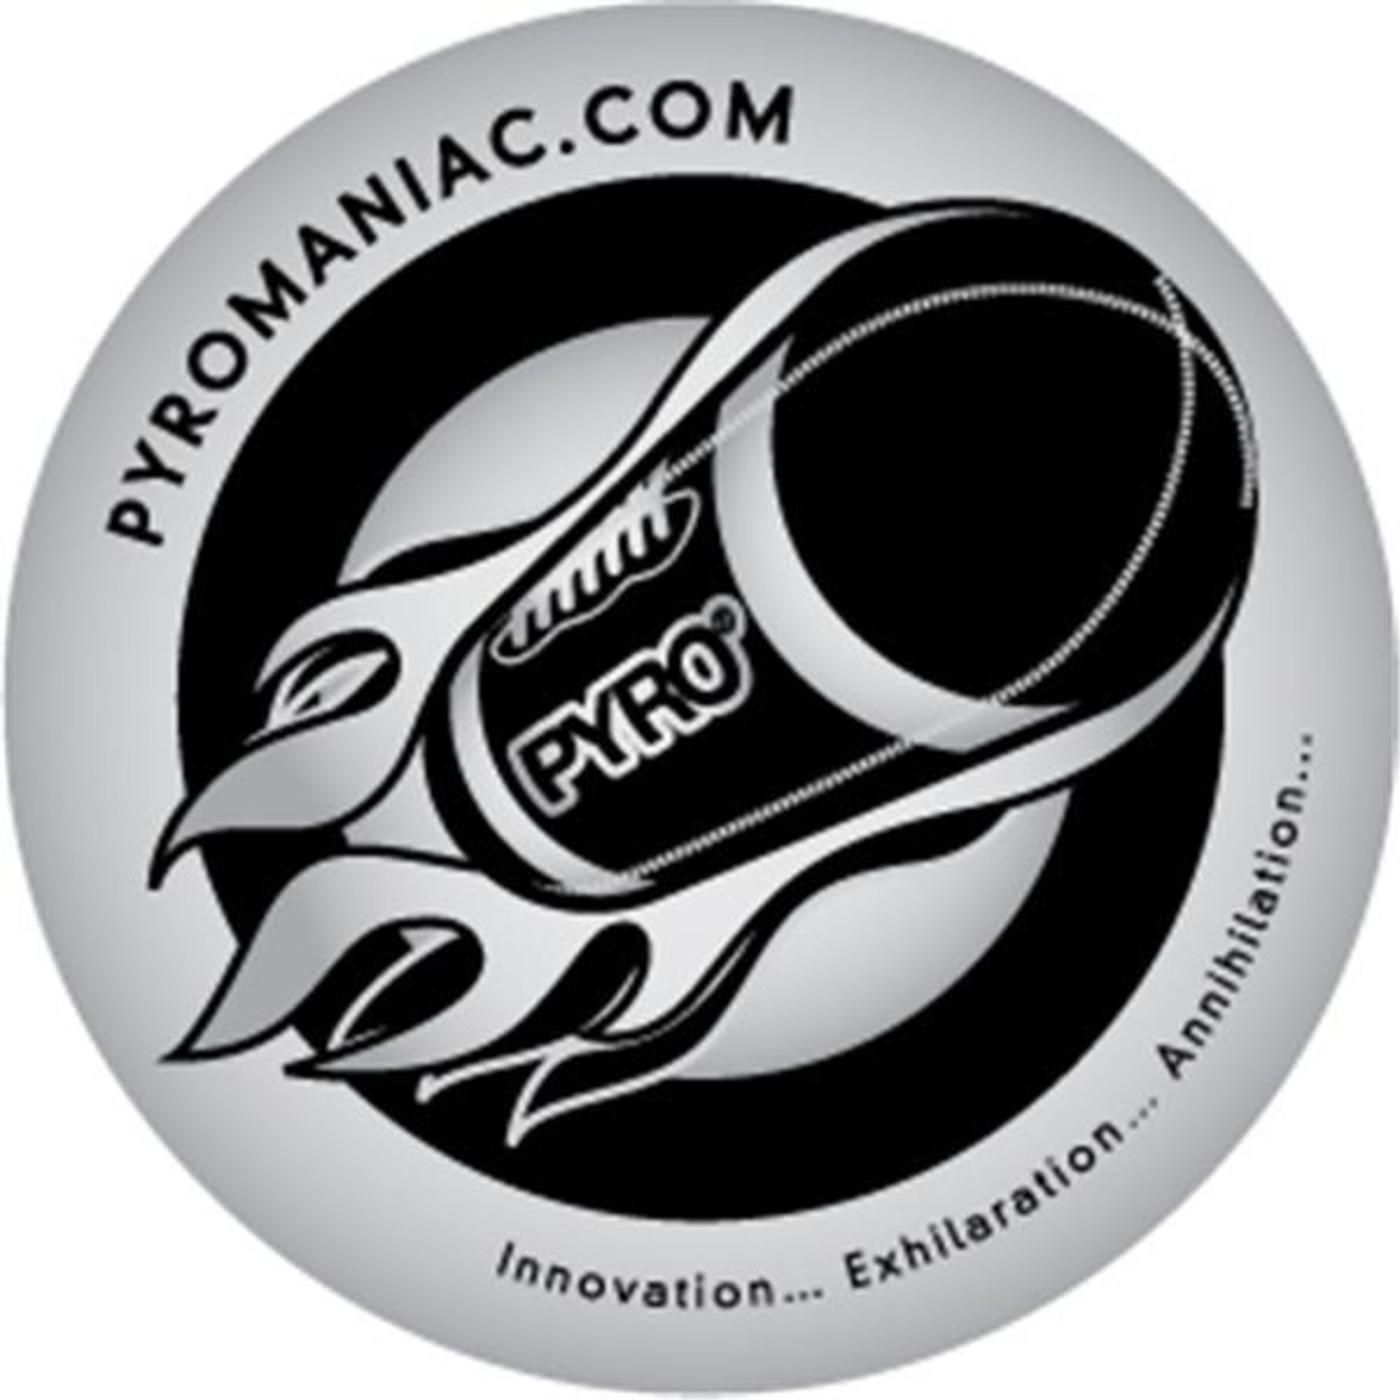 PYRO_LION Online Radio by PYRO Fire | BlogTalkRadio